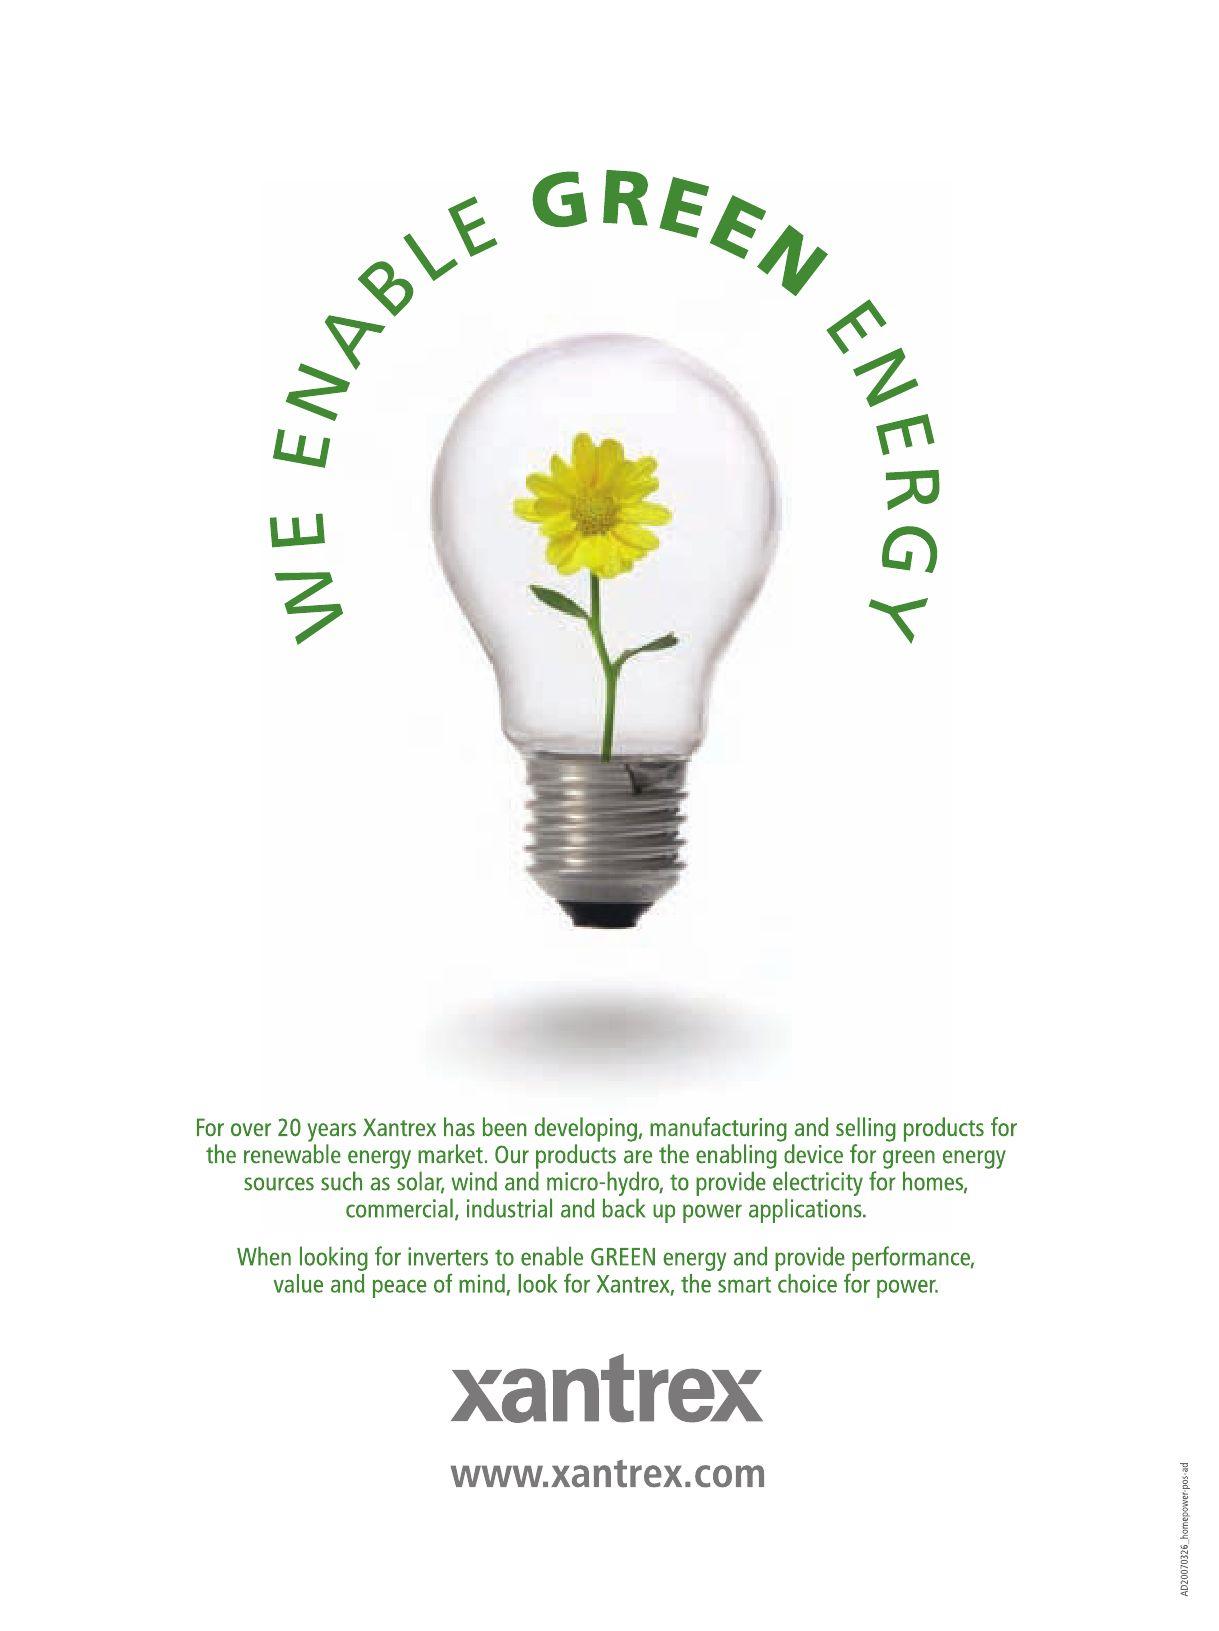 Home Power Magazine 119 By Accion Sustentable Issuu Empower Solar Inverter Wiring Diagram